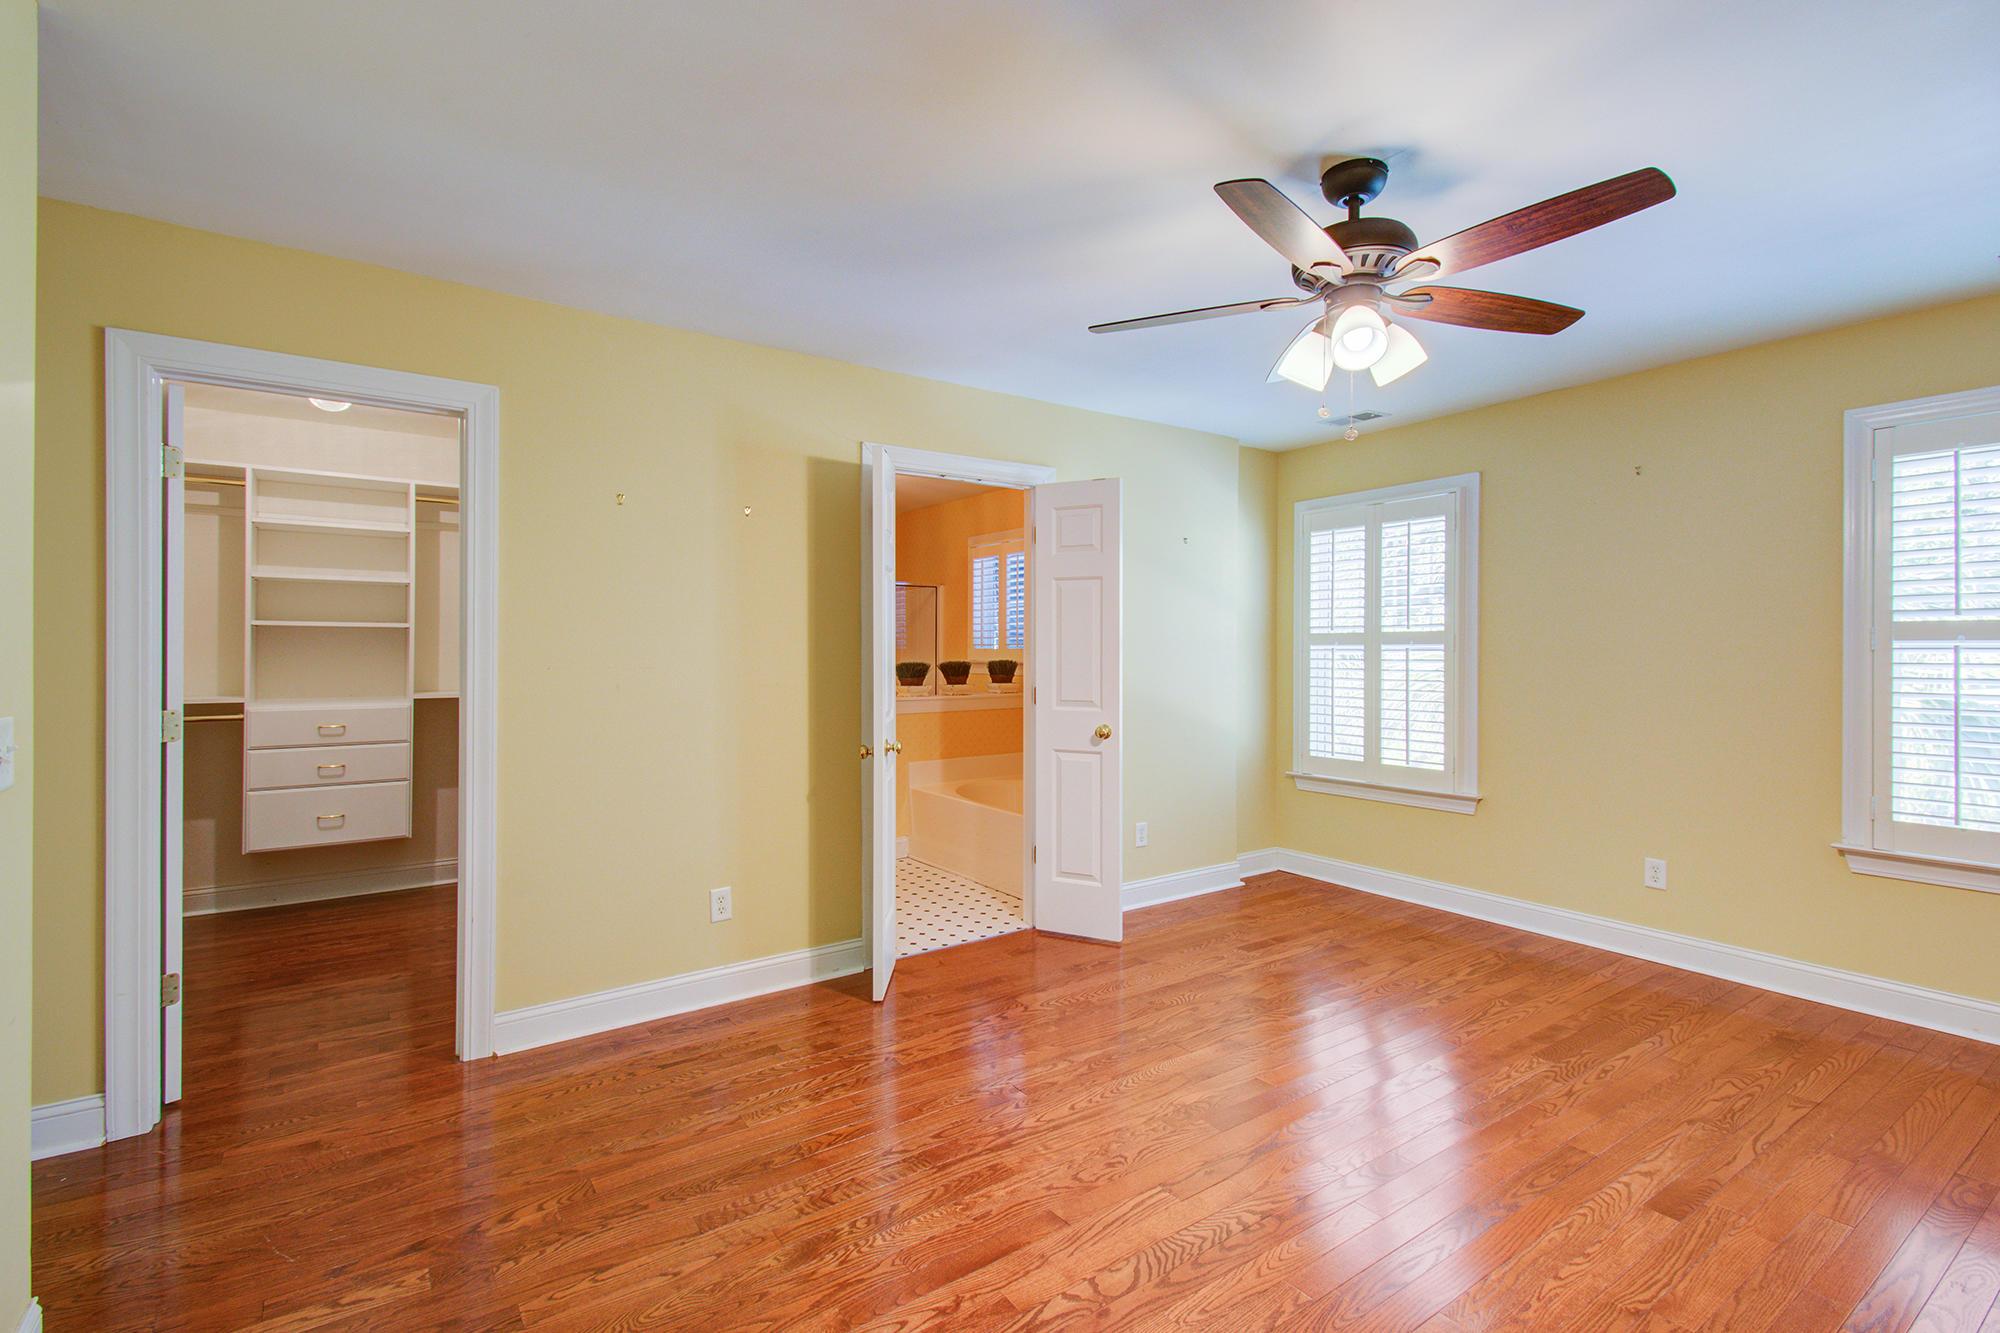 Center Park Homes For Sale - 950 Crossing, Daniel Island, SC - 51